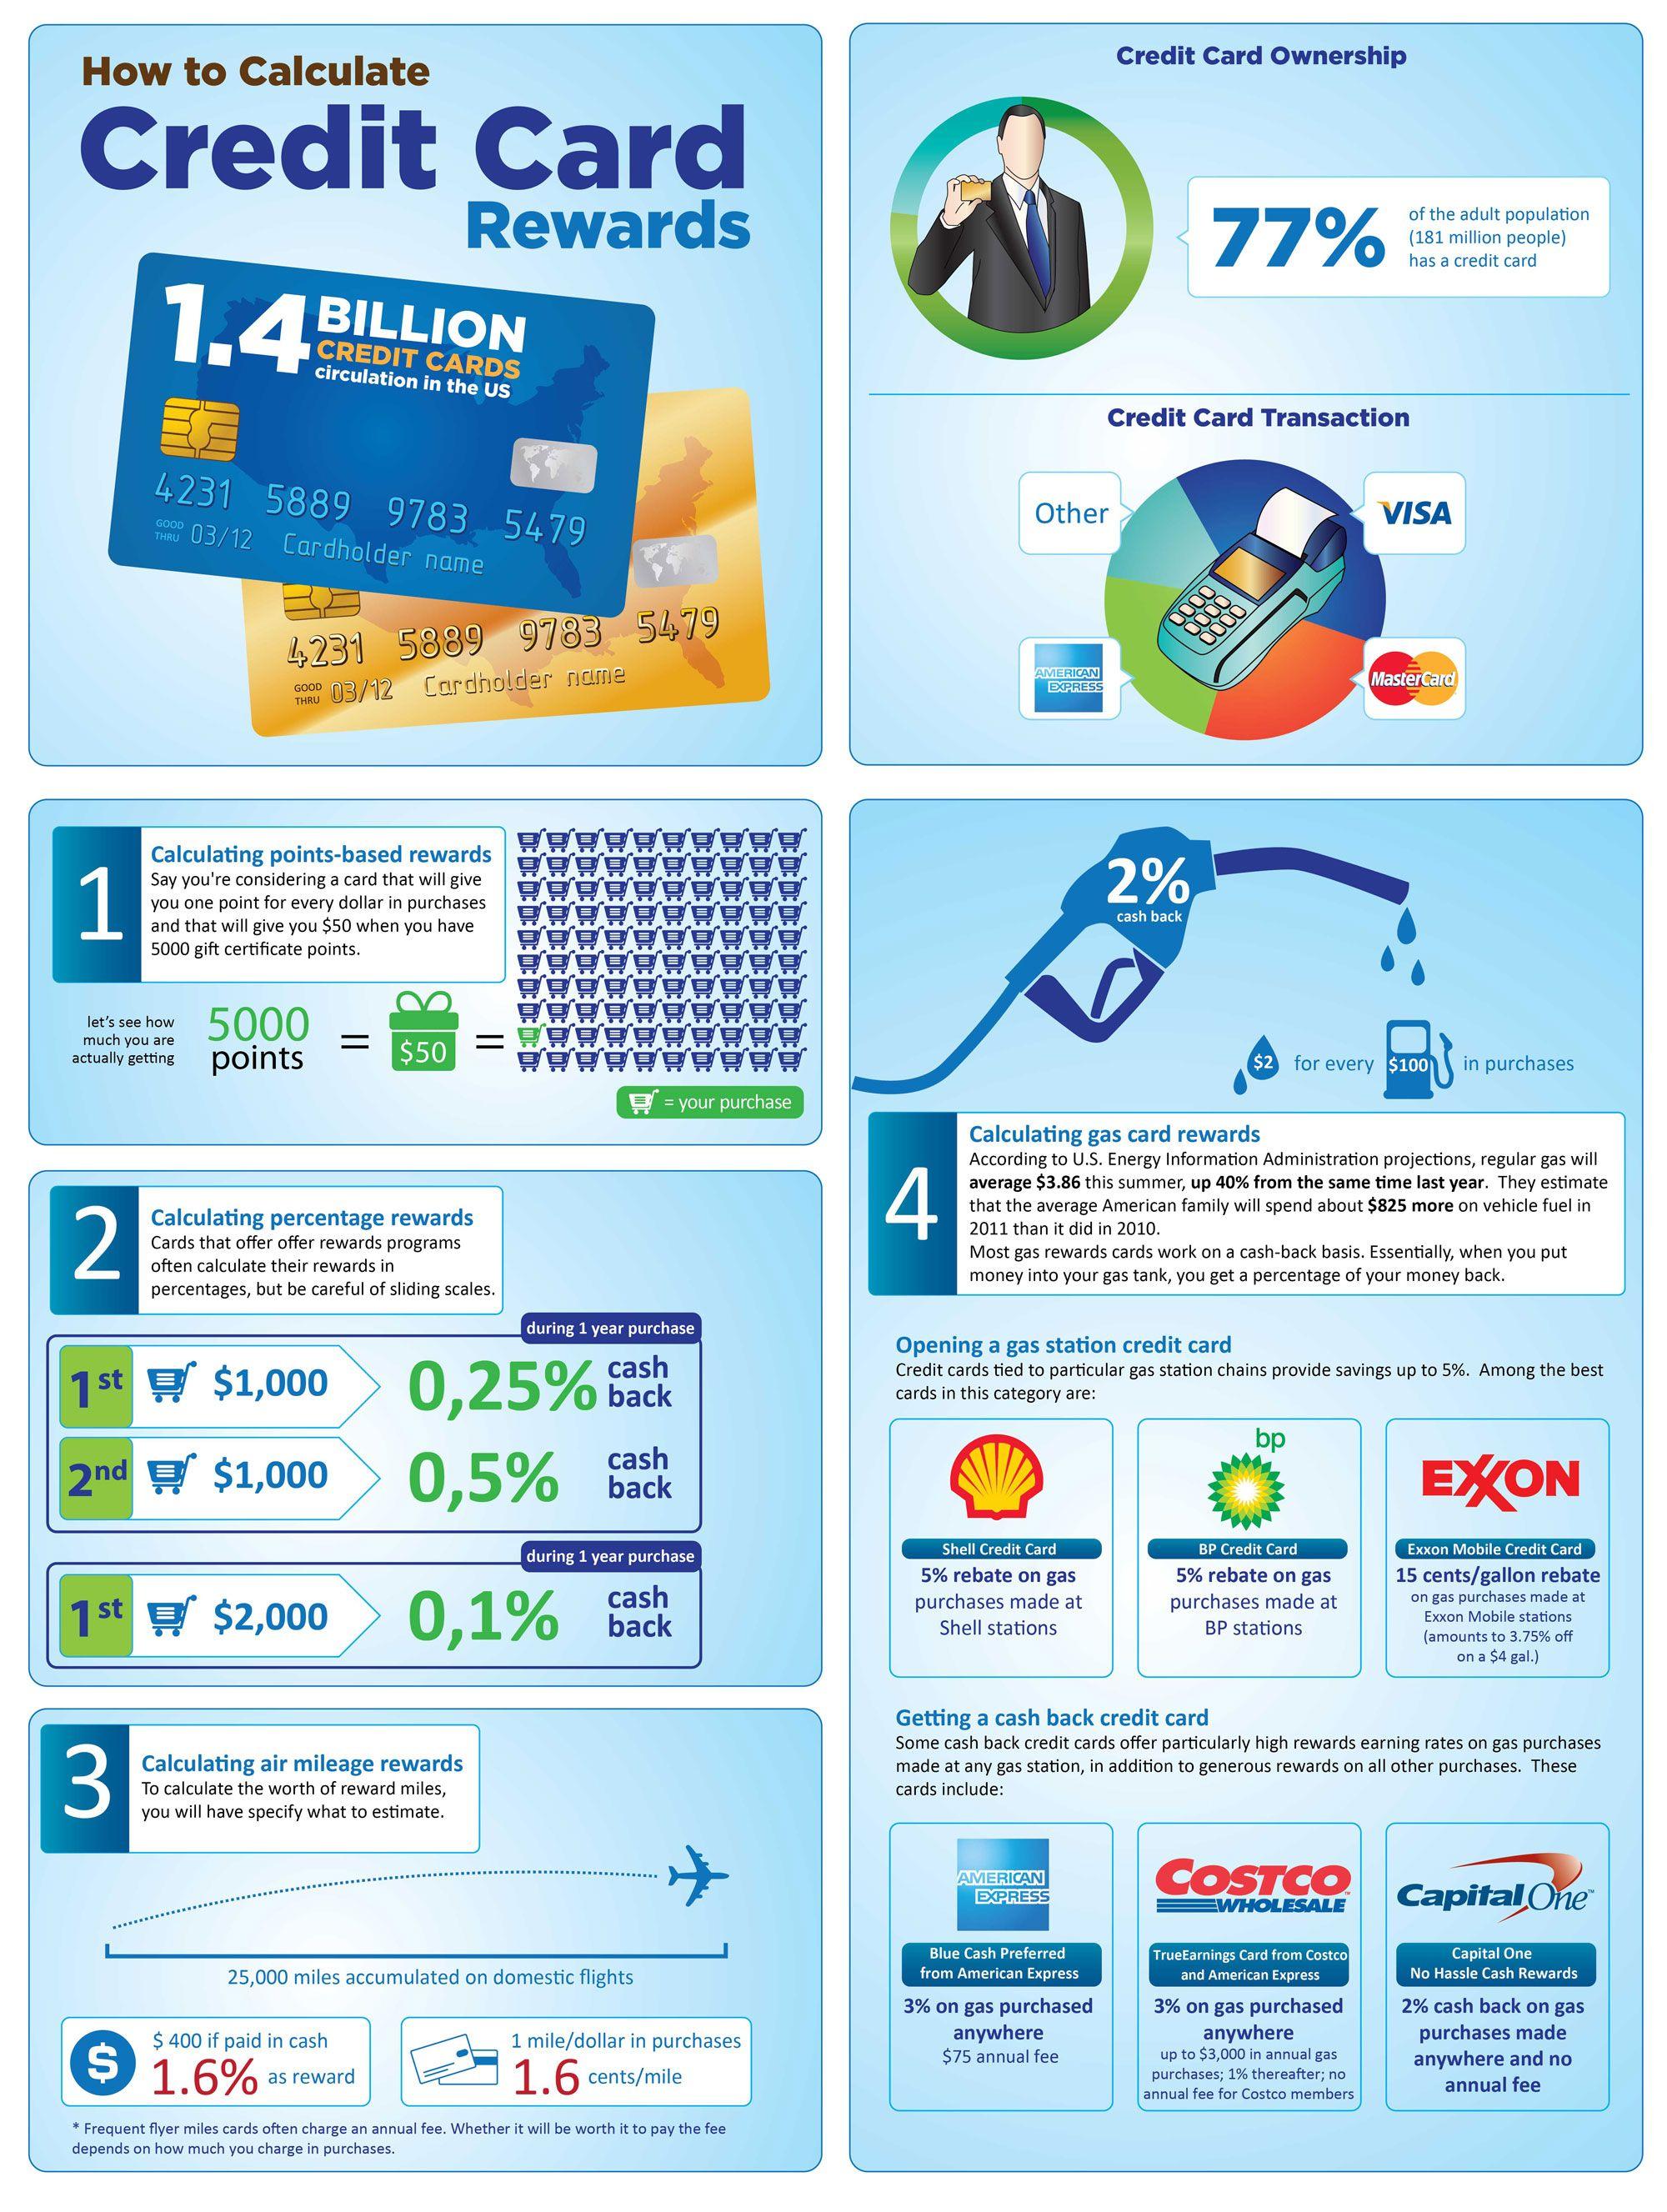 Personal Loans Online Rewards Credit Cards Credit Card Info